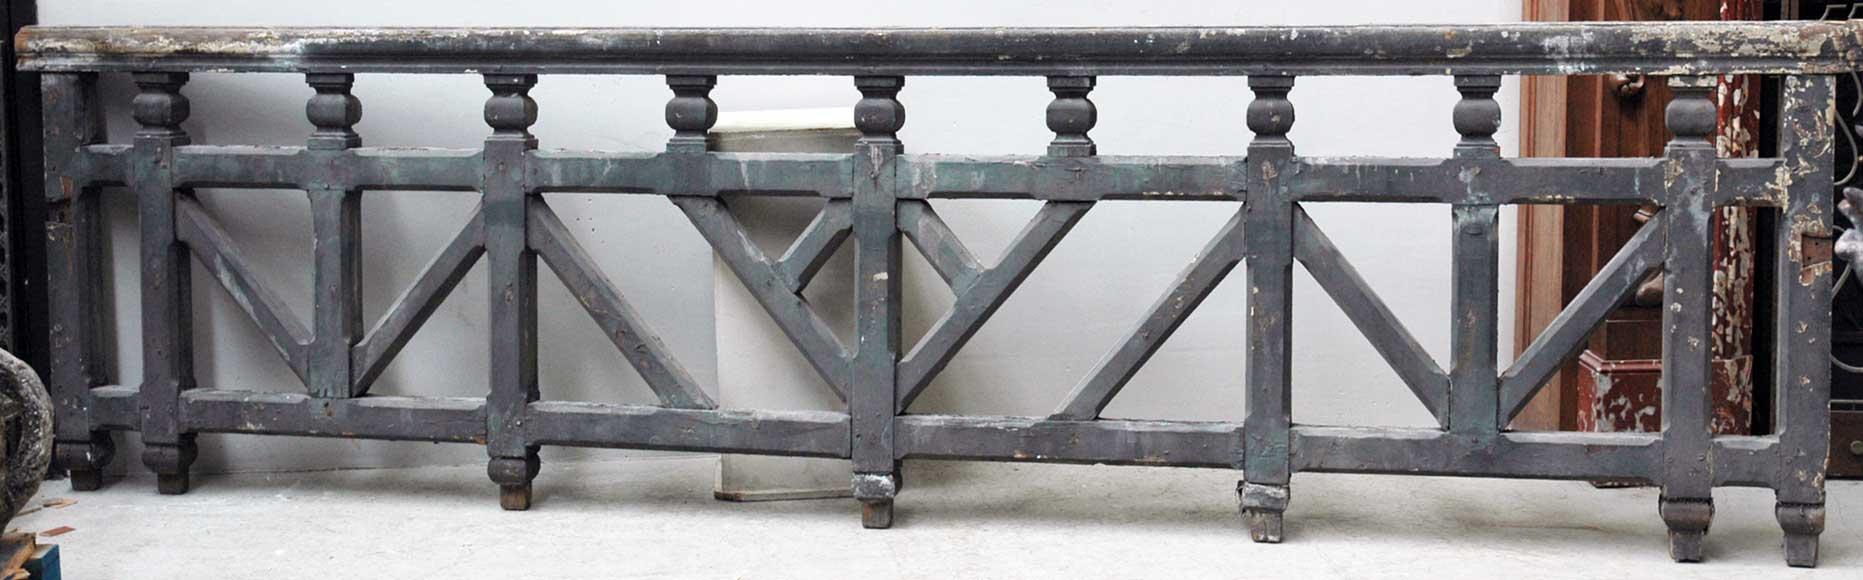 rambarde de bois escaliers et rampes. Black Bedroom Furniture Sets. Home Design Ideas